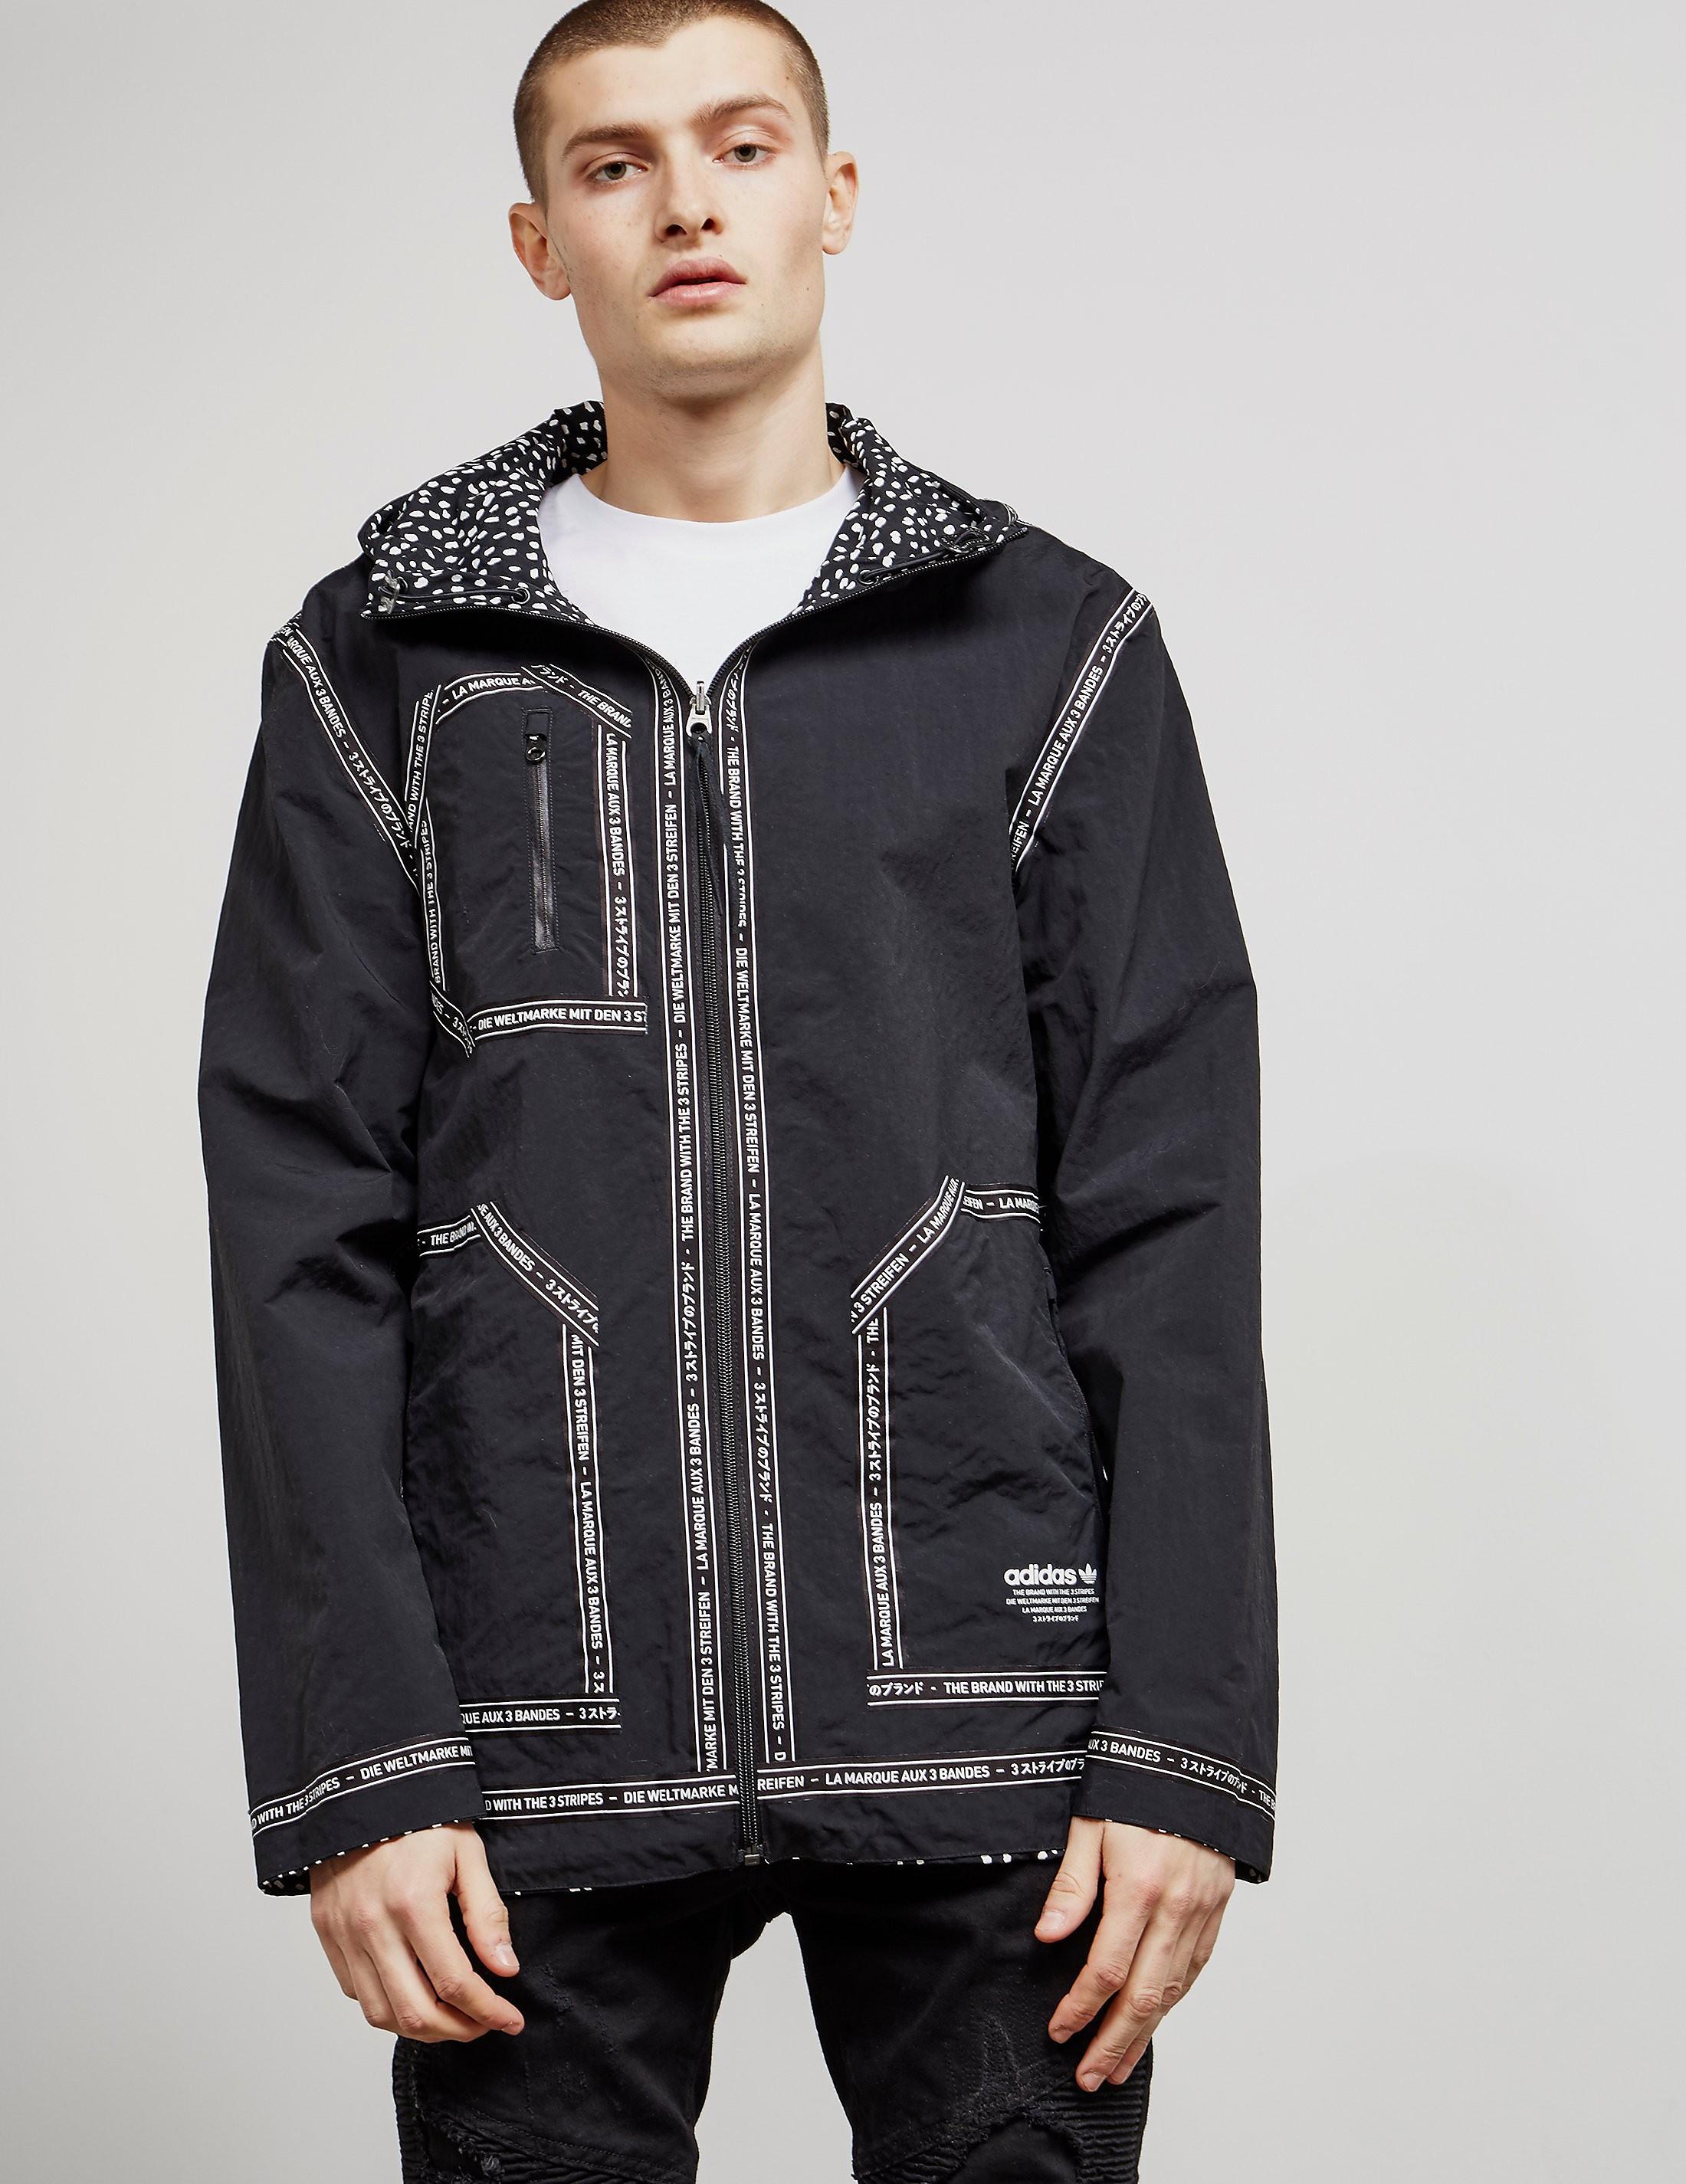 adidas Originals NMD Reversible Field Jacket